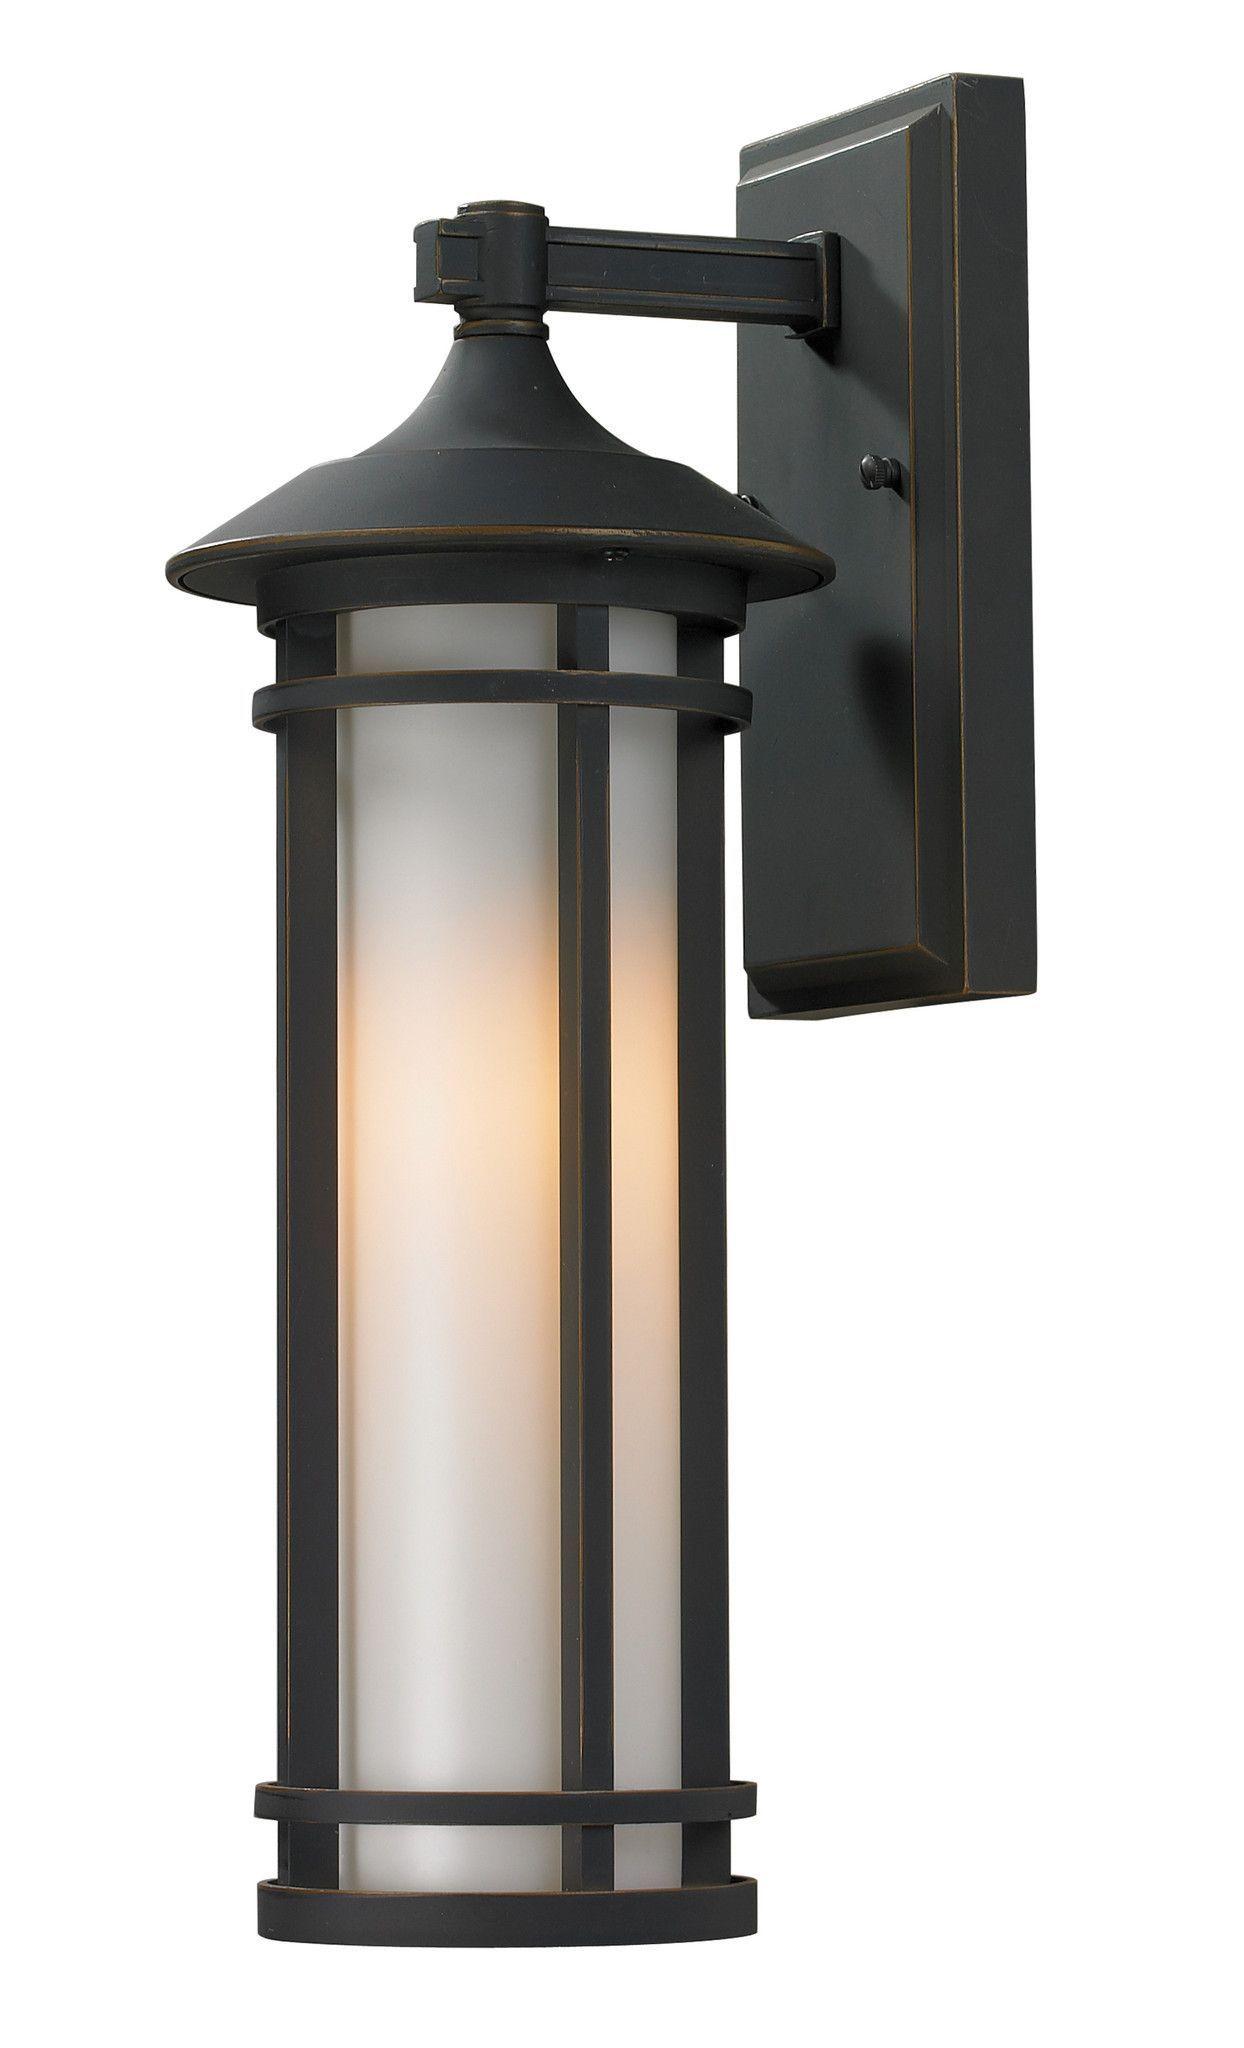 Zlite woodland sorb outdoor light products